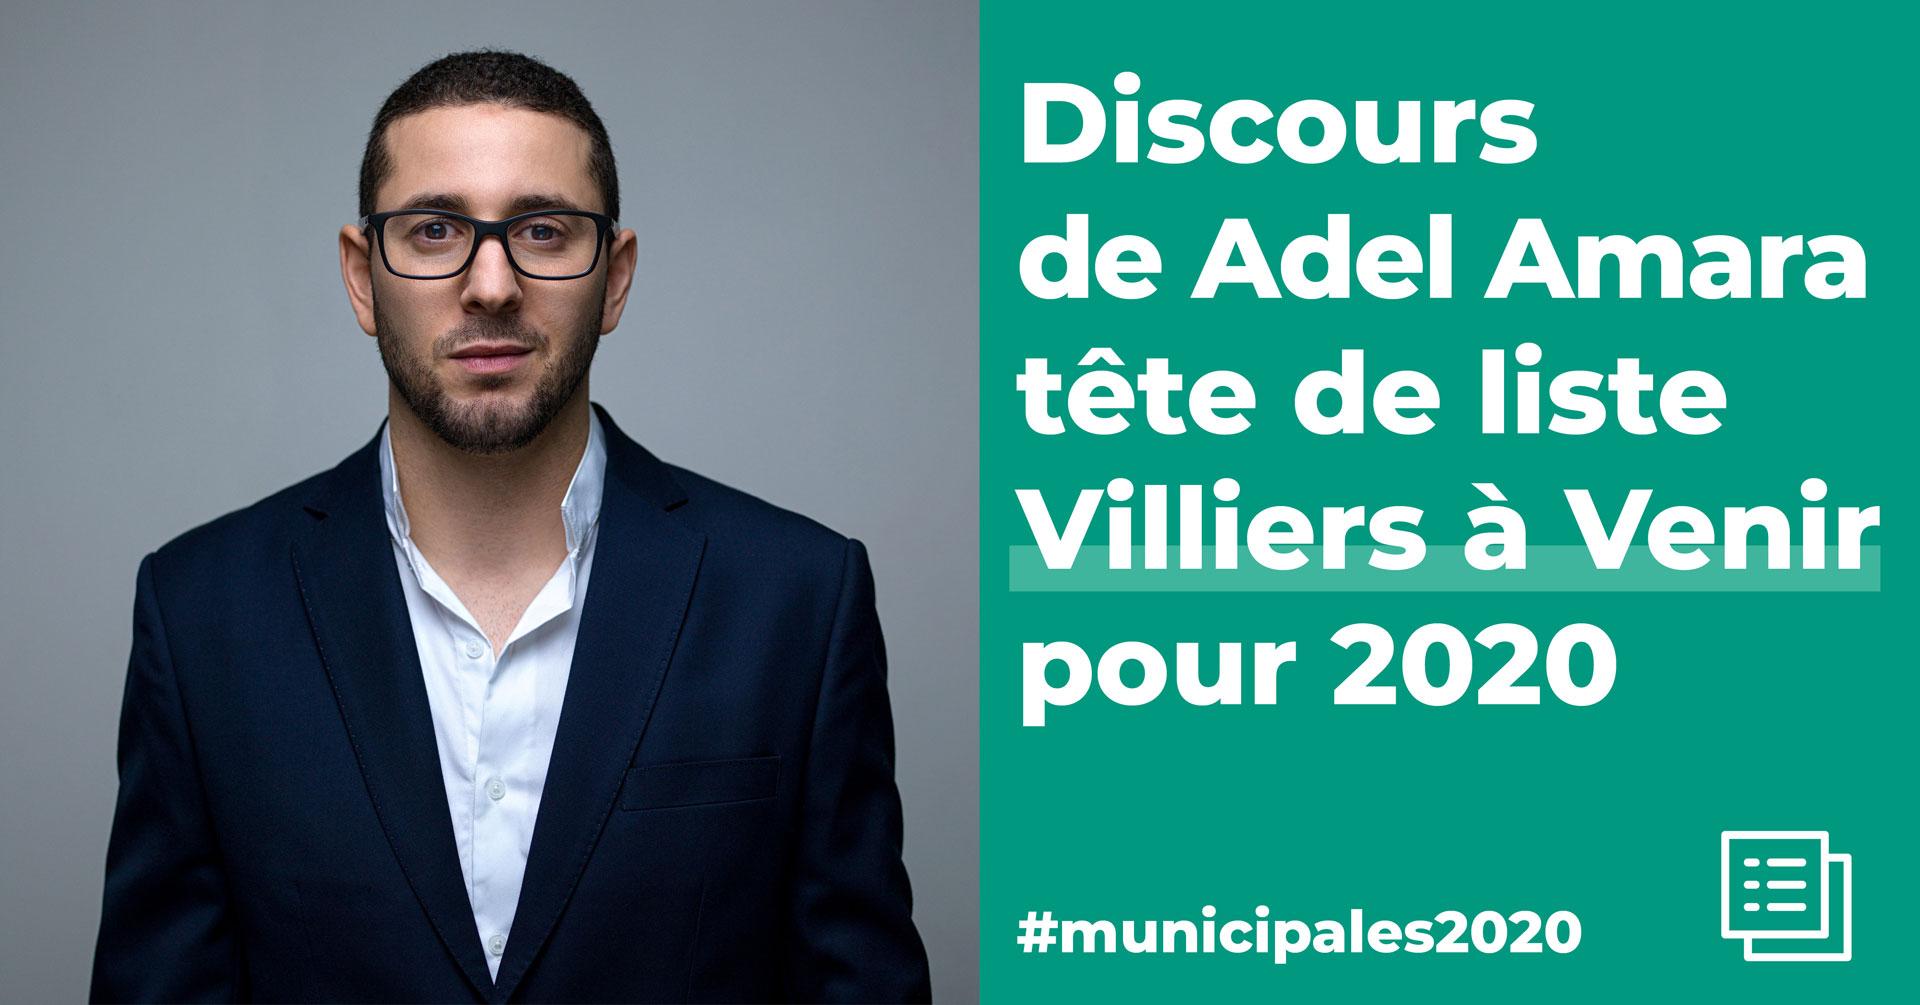 https://vav94.fr/wp-content/uploads/2020/01/DISCOURS-ADEL-AMARA-TETE-DE-LISTES-VAV-94-VILLIERS-AVENIR-VILLIERS-SUR-MARNE-MUNICIPALES-2020-2.jpg